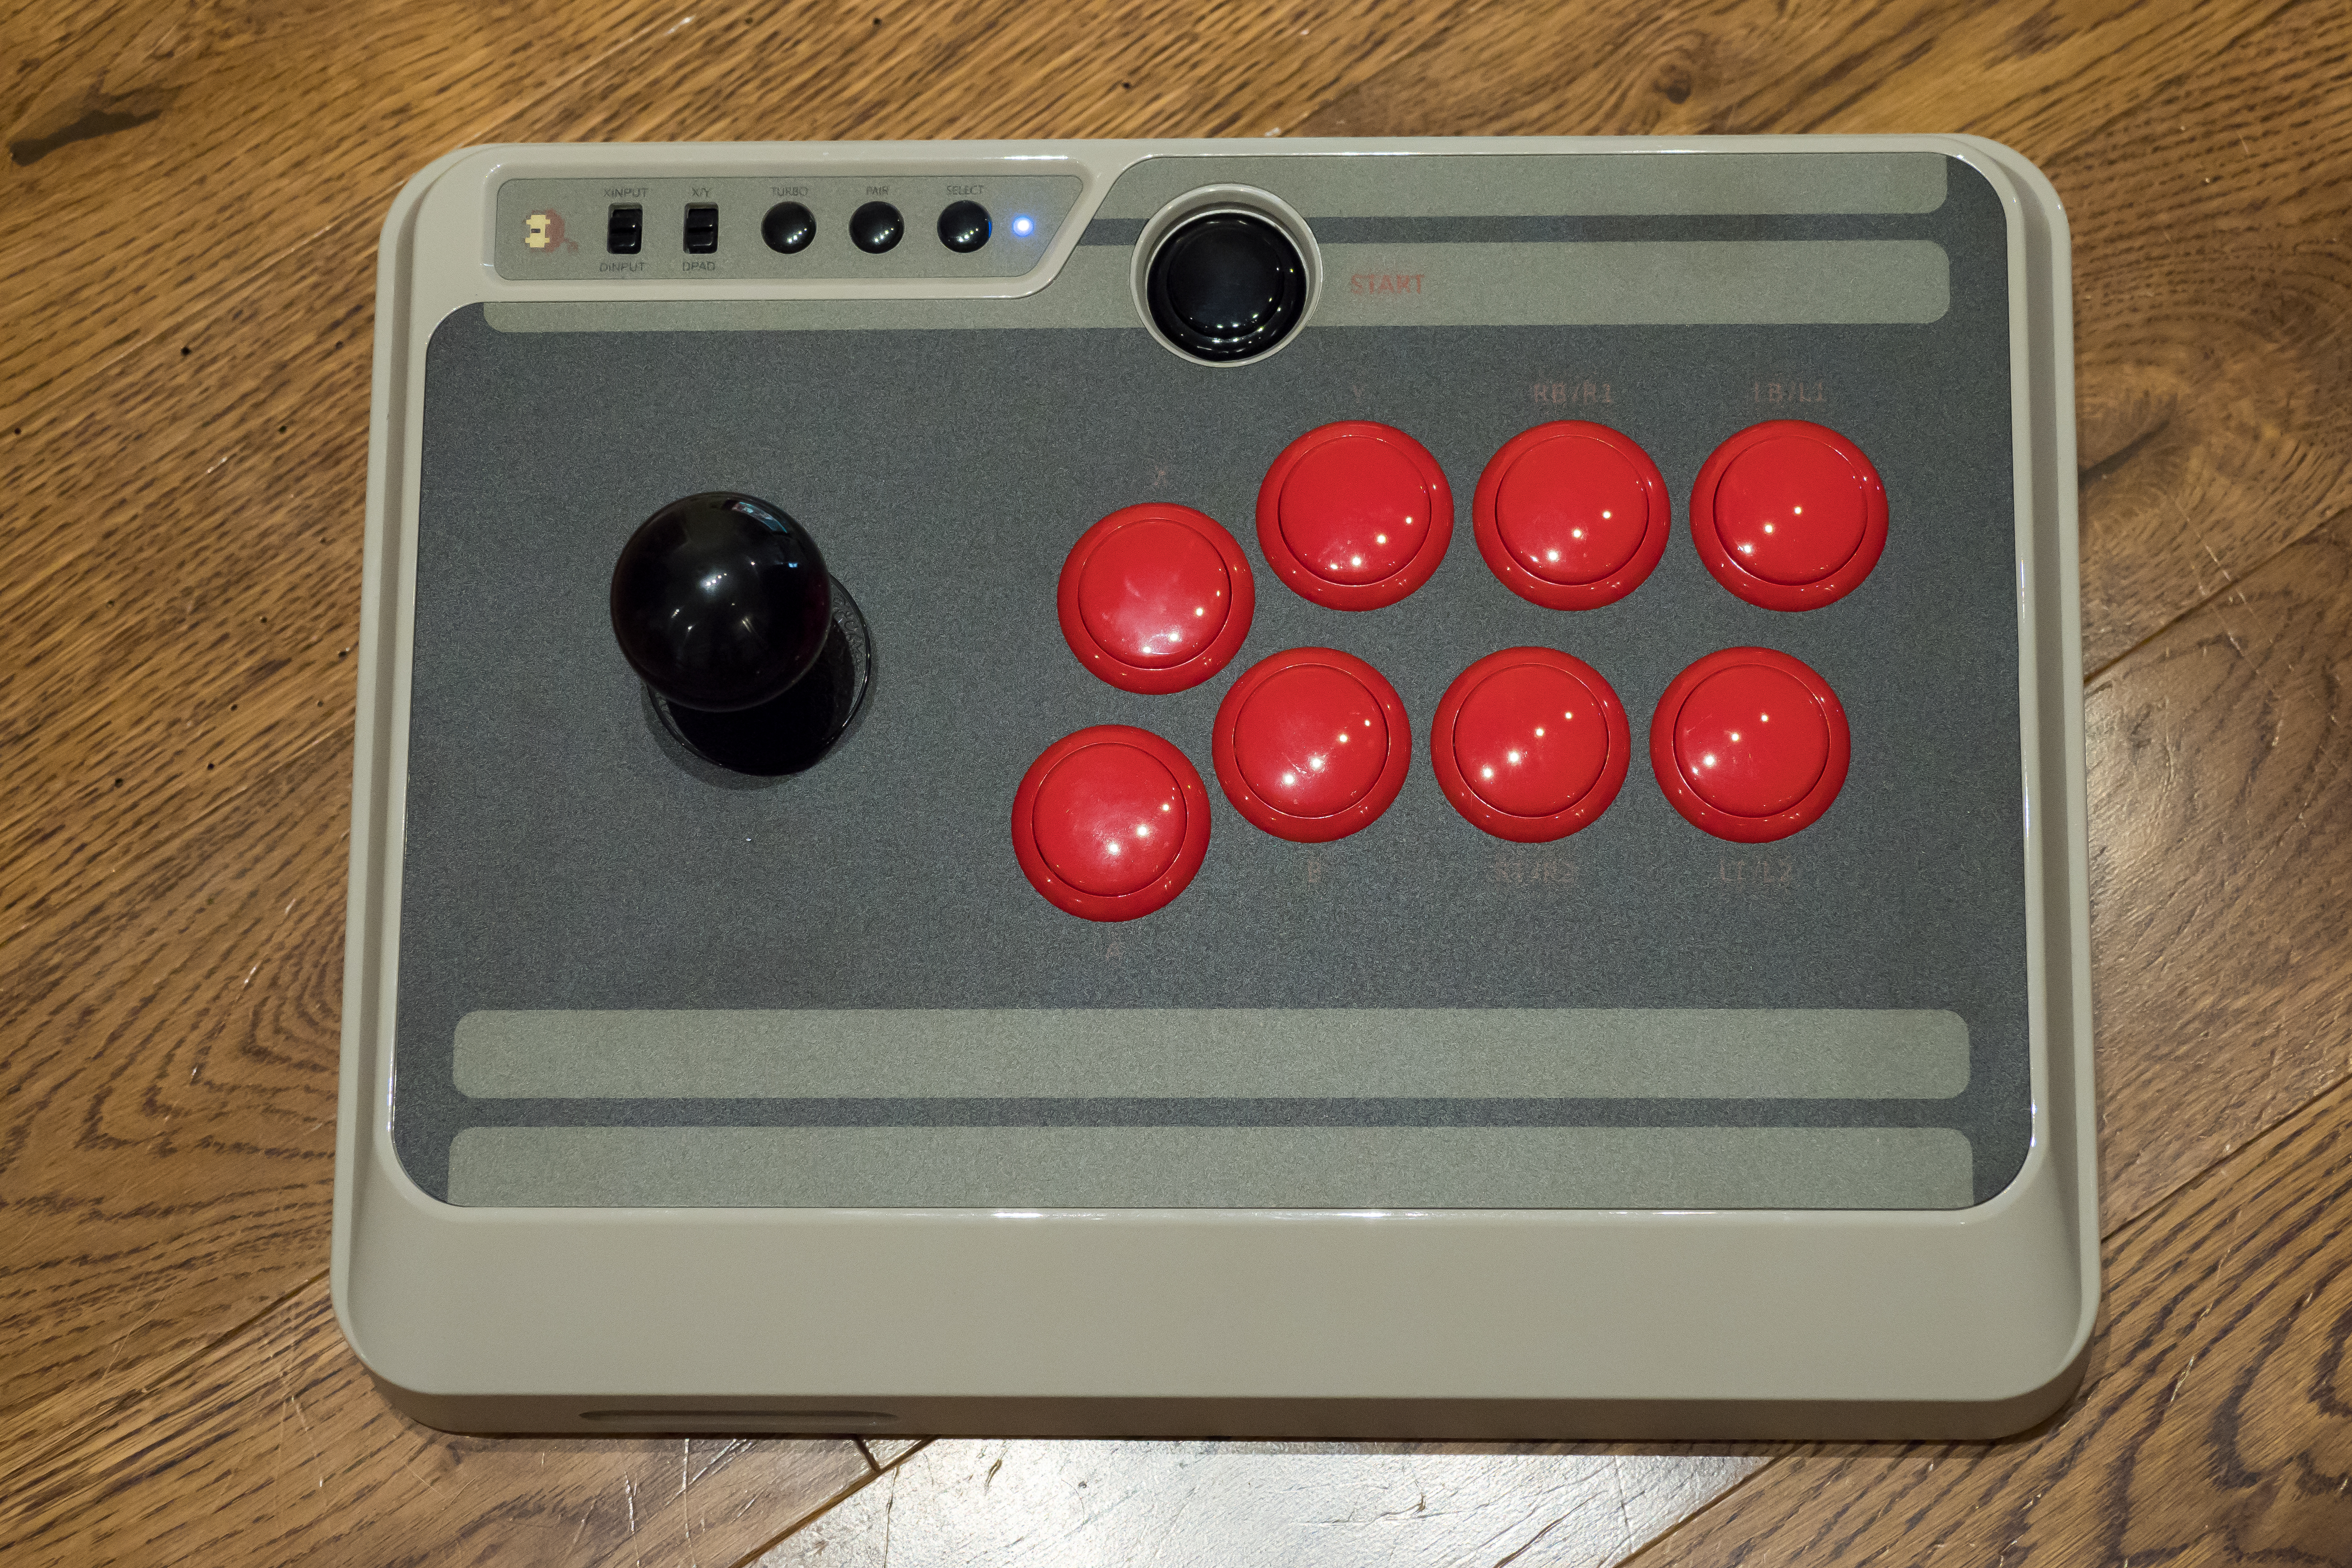 8bitdo's NES30 Arcade Stick is a big, beautiful fighter